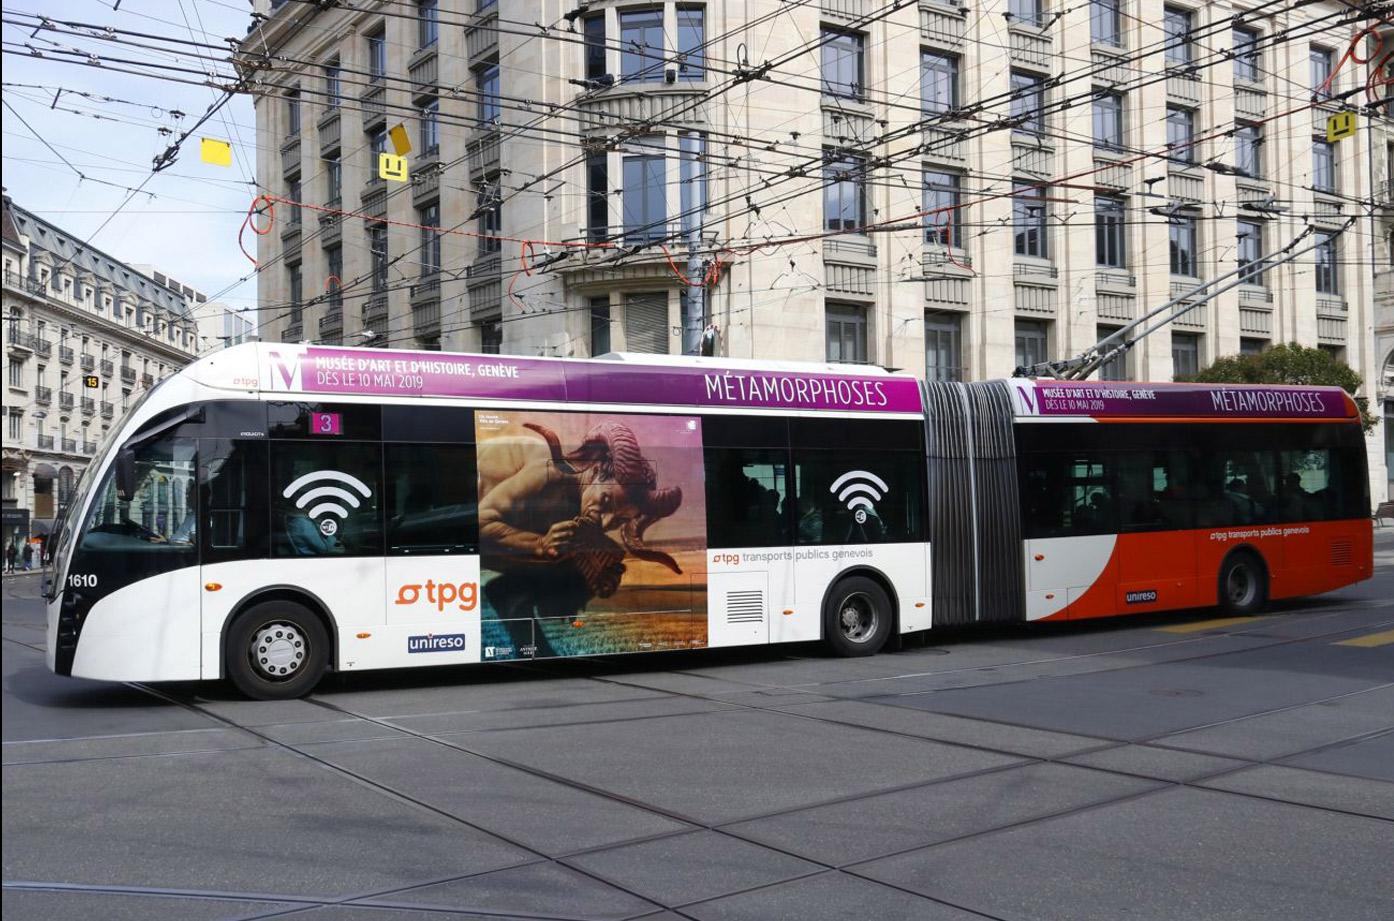 Musee-Art-Histoire-Exposition-Metamorphoses-Bus-tpg-Sophie-Jaton